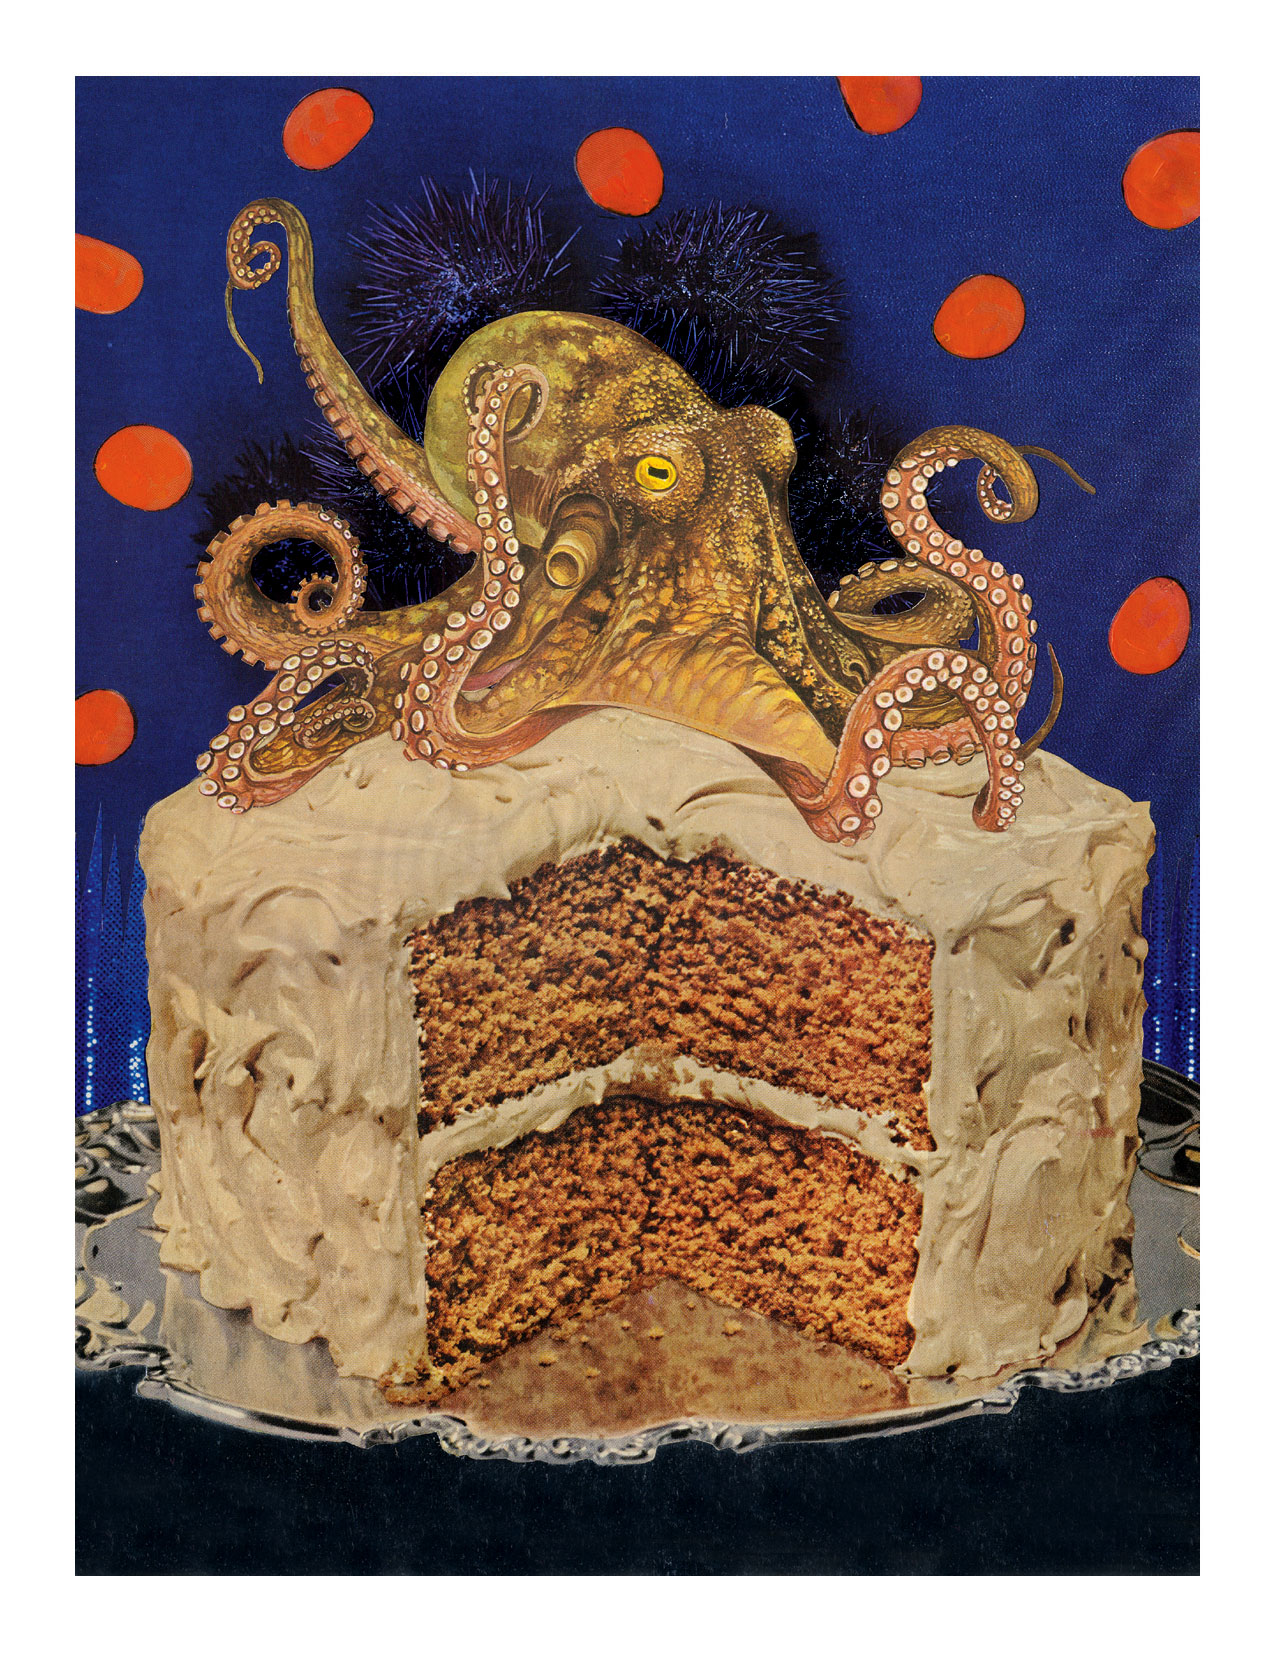 card-Octopus-Cakew.jpg